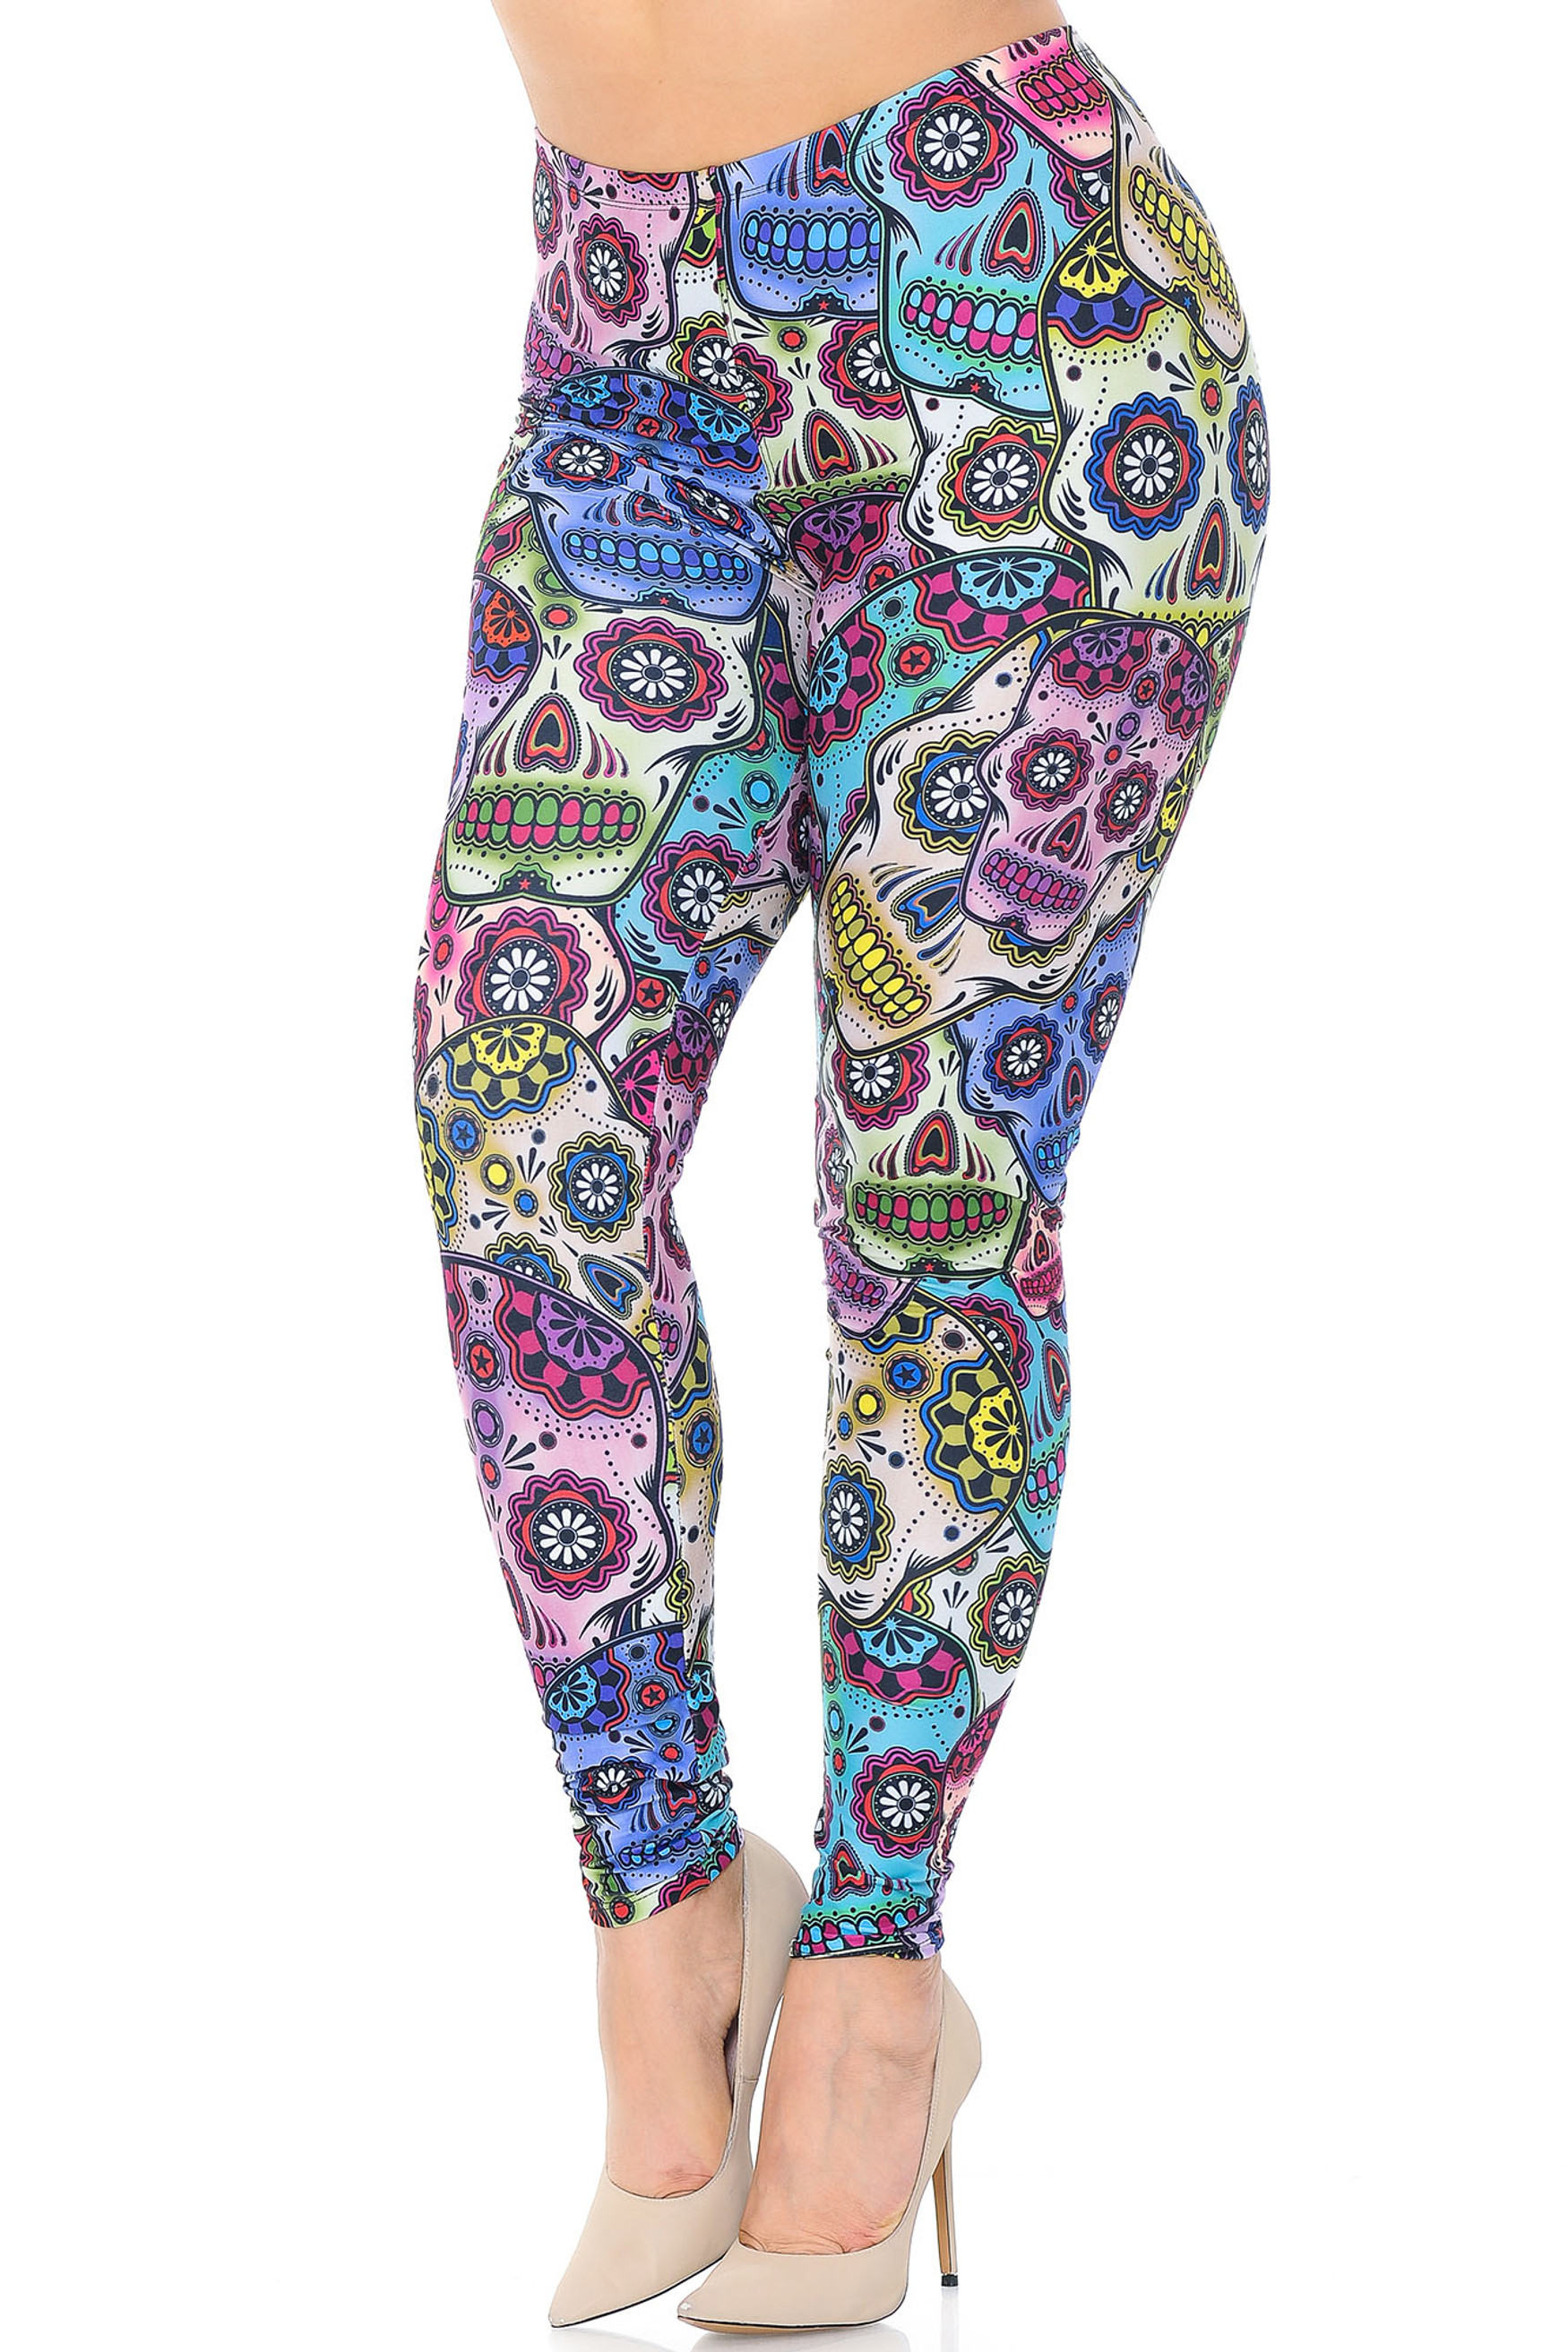 Creamy Soft Sugar Skull Plus Size Leggings - USA Fashion™